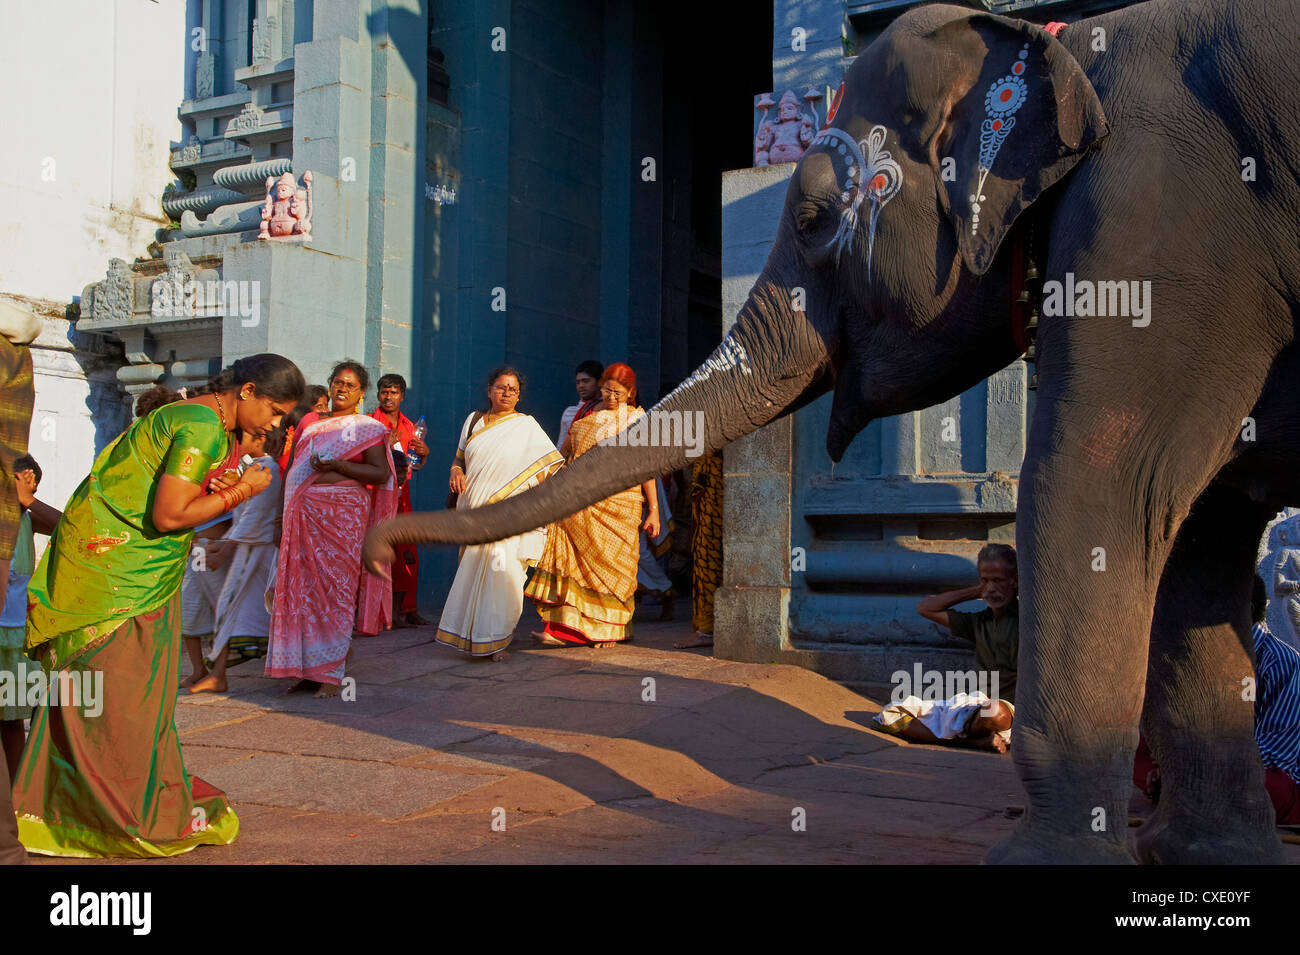 Benedizione di elefante, Kamakshi Amman, Kanchipuram, Tamil Nadu, India, Asia Immagini Stock